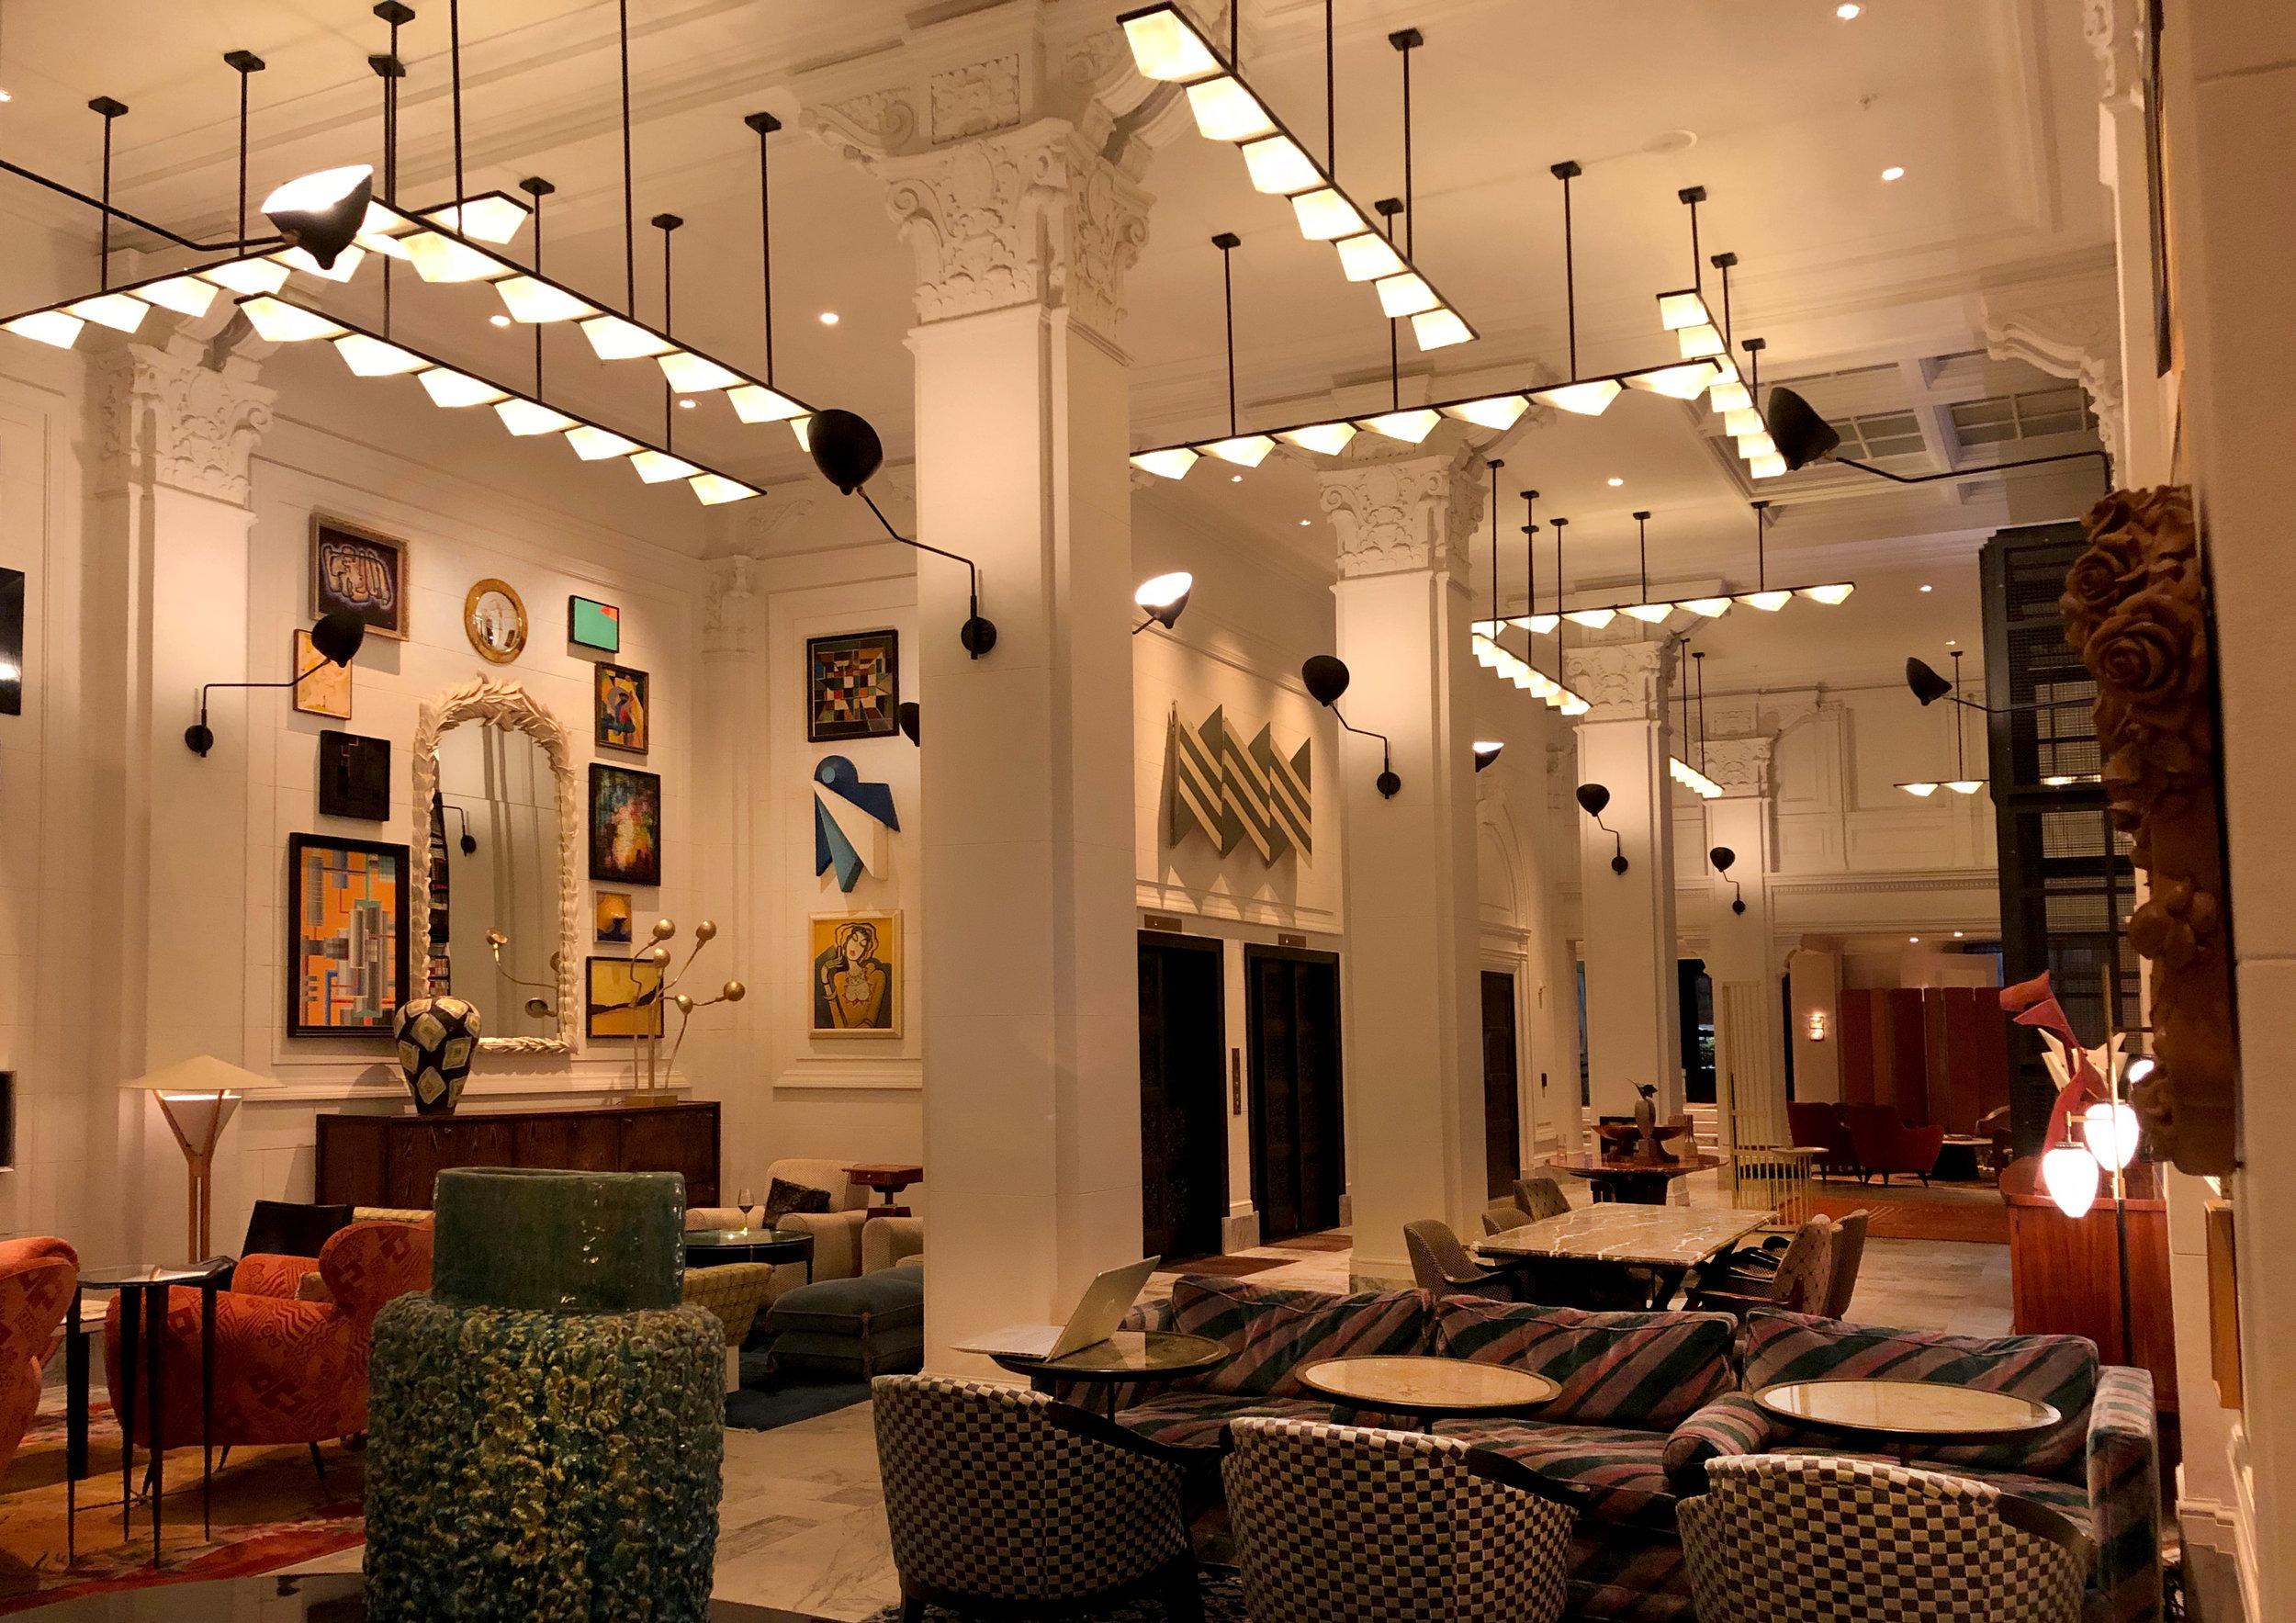 proper hotel vortex lighting